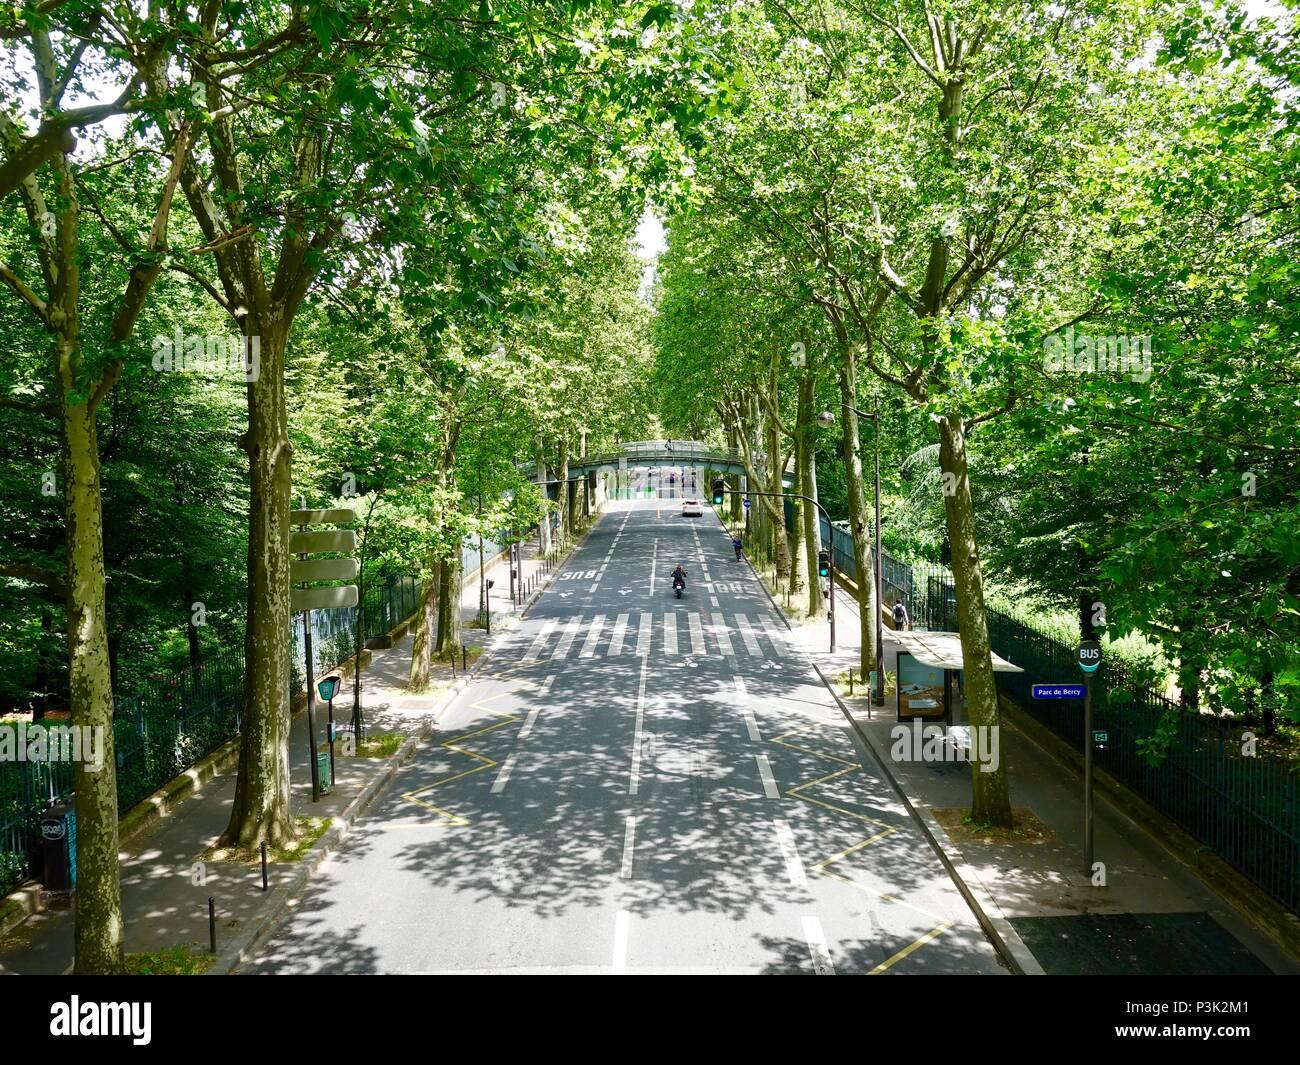 Rue Joseph Keseel, street passing through section of Bercy Park, Paris, France - Stock Image